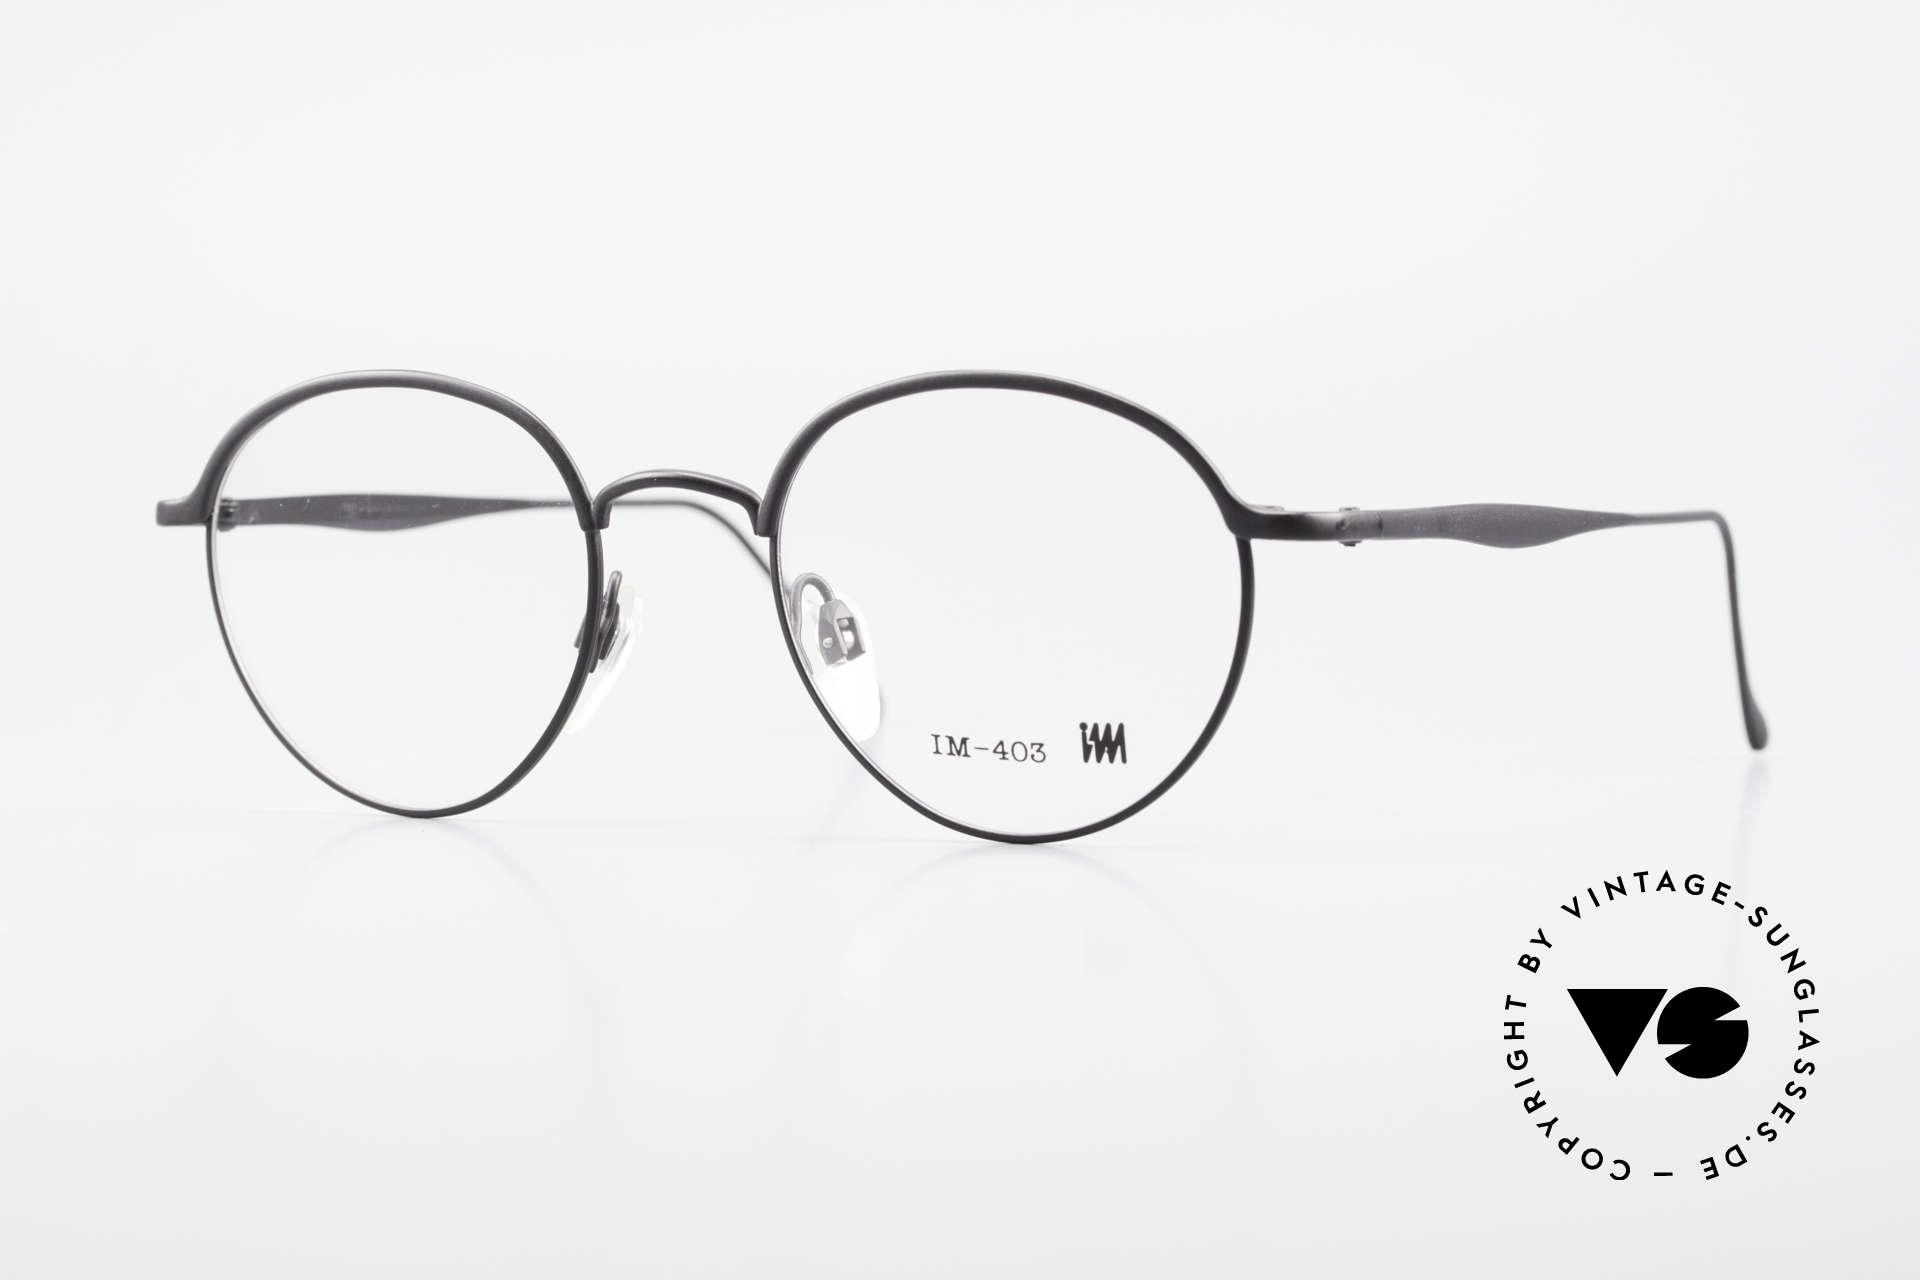 Miyake Design Studio IM403 Connoisseur Panto Glasses 90's, interesting PANTO style eyeglasses from 1995, Made for Men and Women